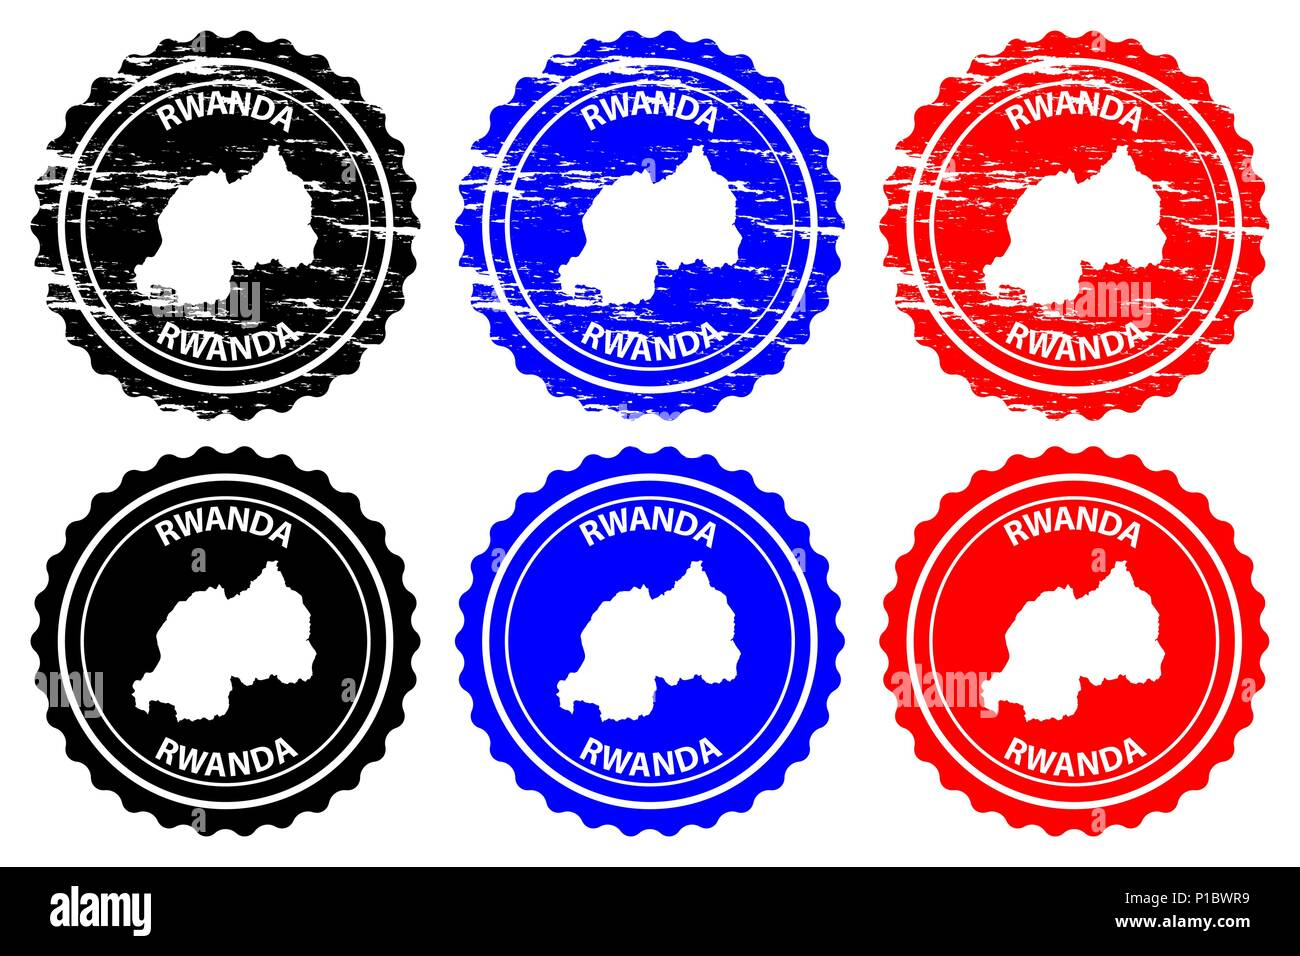 Rwanda - rubber stamp - vector, Republic of Rwanda map pattern - sticker - black, blue, and red - Stock Vector